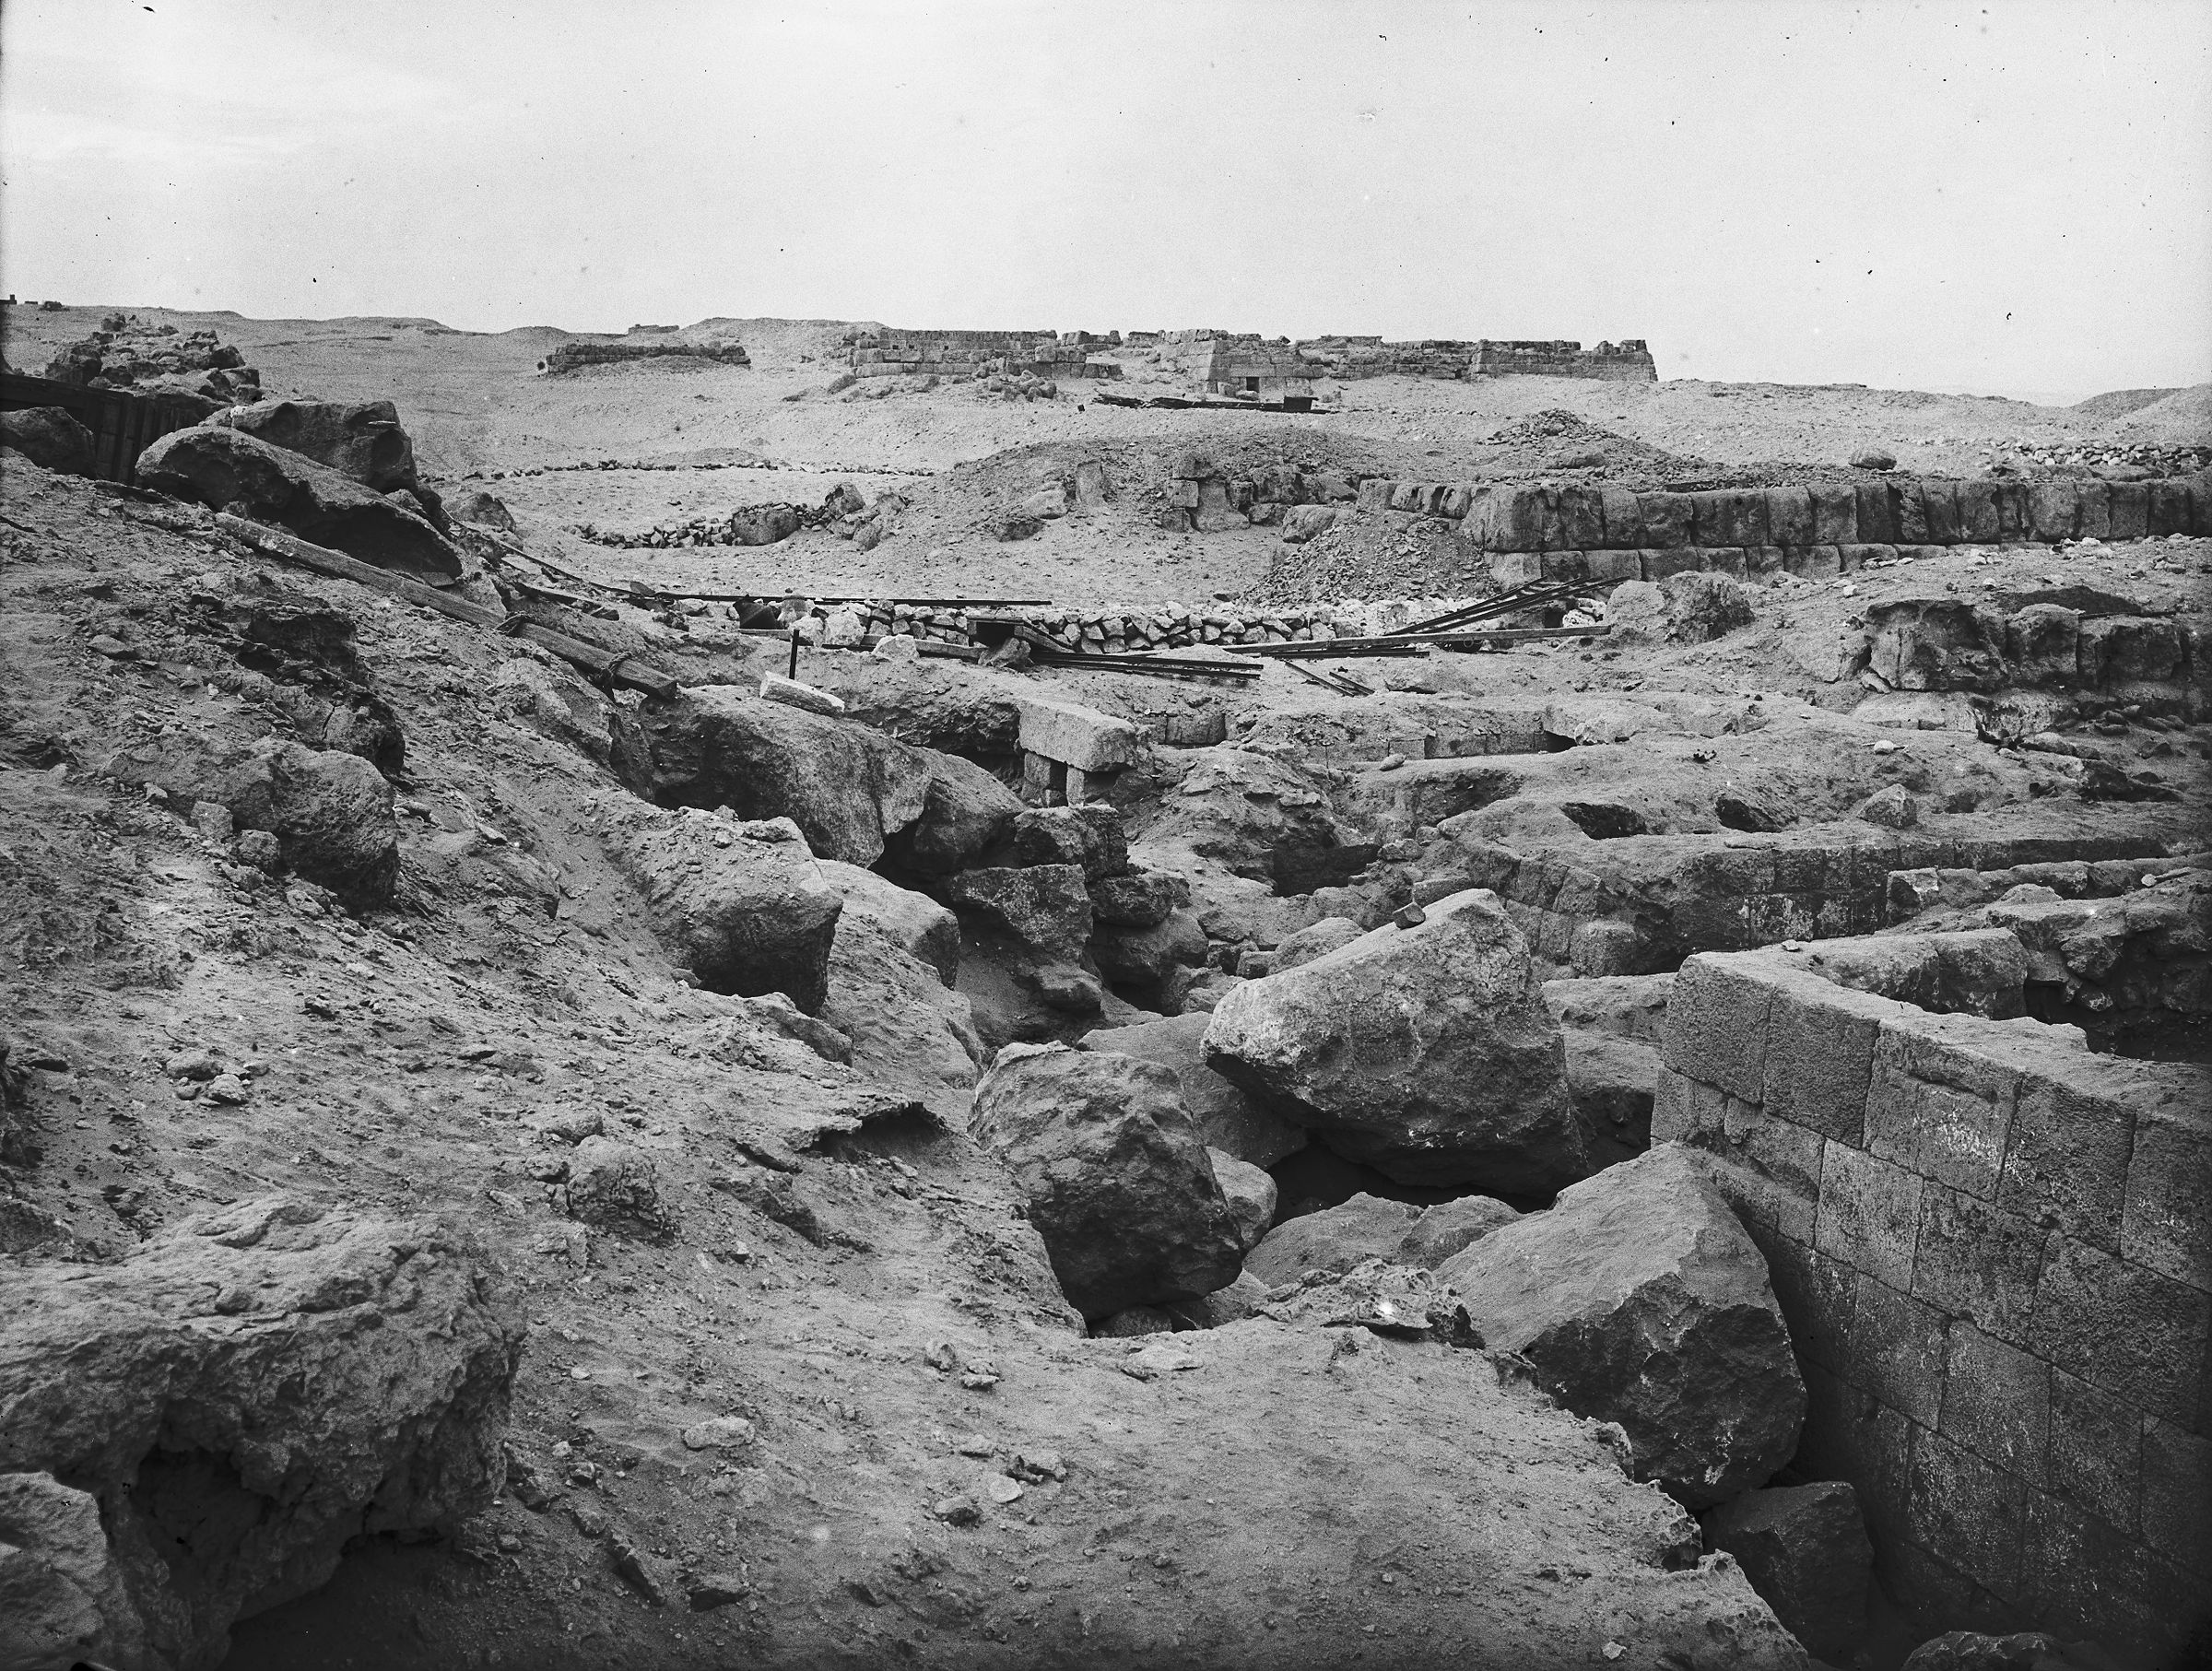 Western Cemetery: Site: Giza; View: G 4611, G 4615, G 4614, G 4512, G 4513